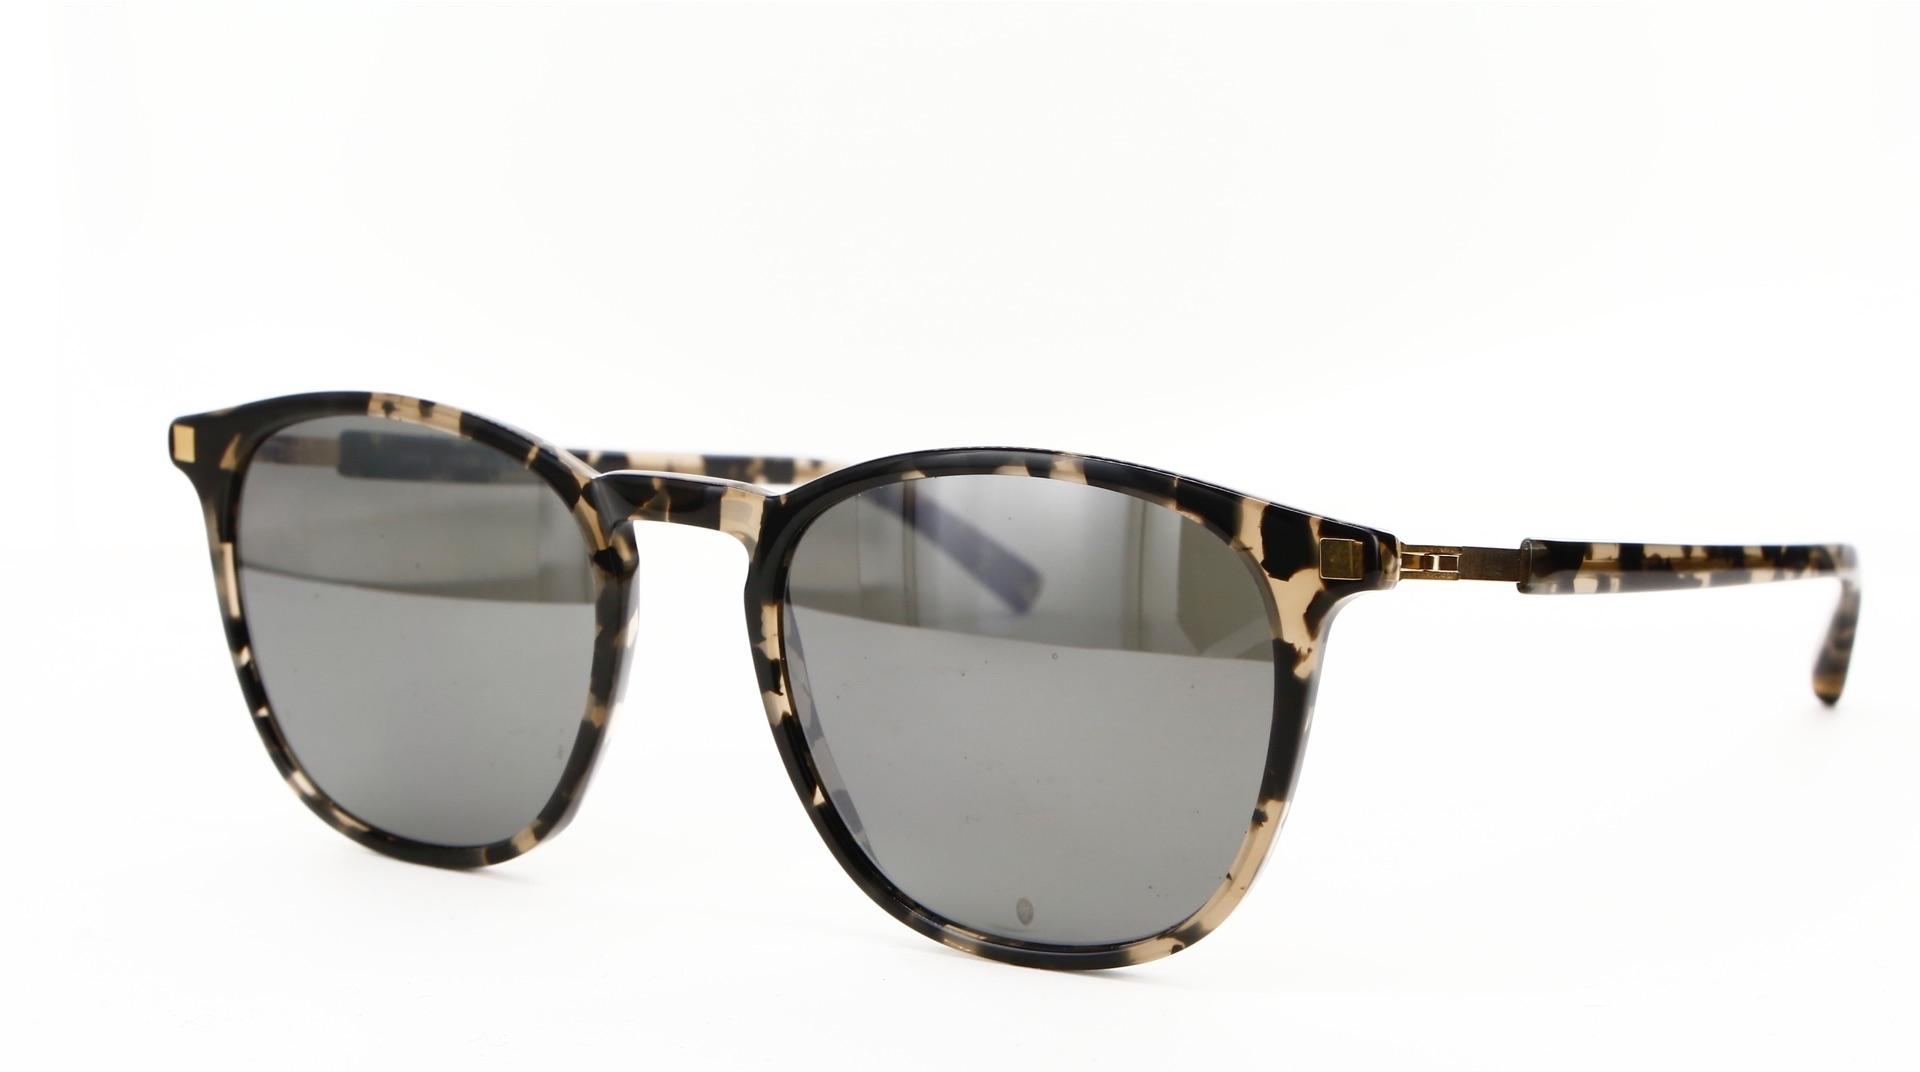 506ac44aed4f Mykita sunglasses - ref  79525